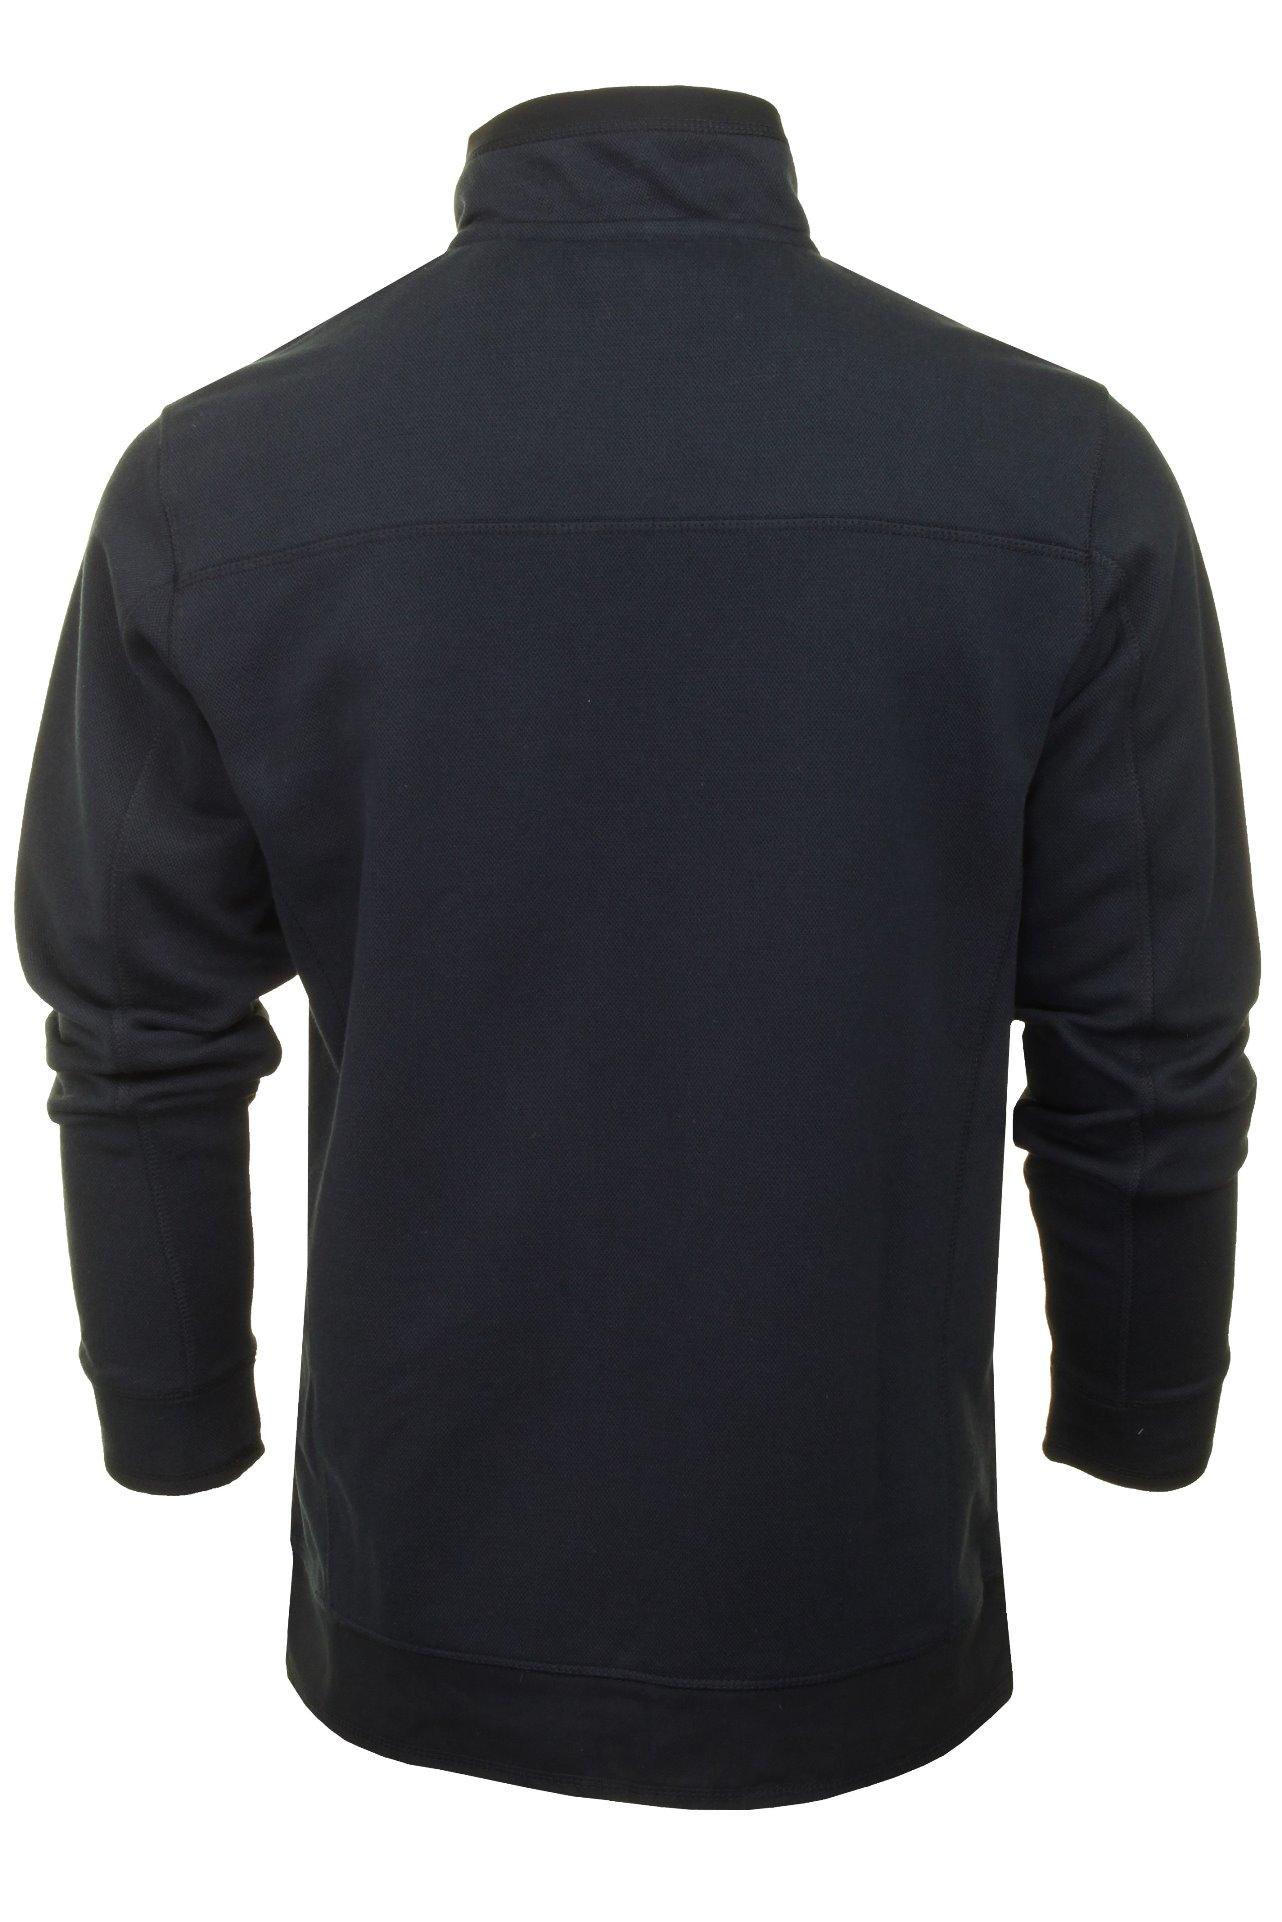 Sweatshirts 'dalesman' Pique Joules Mens Navy a1qUxpvS